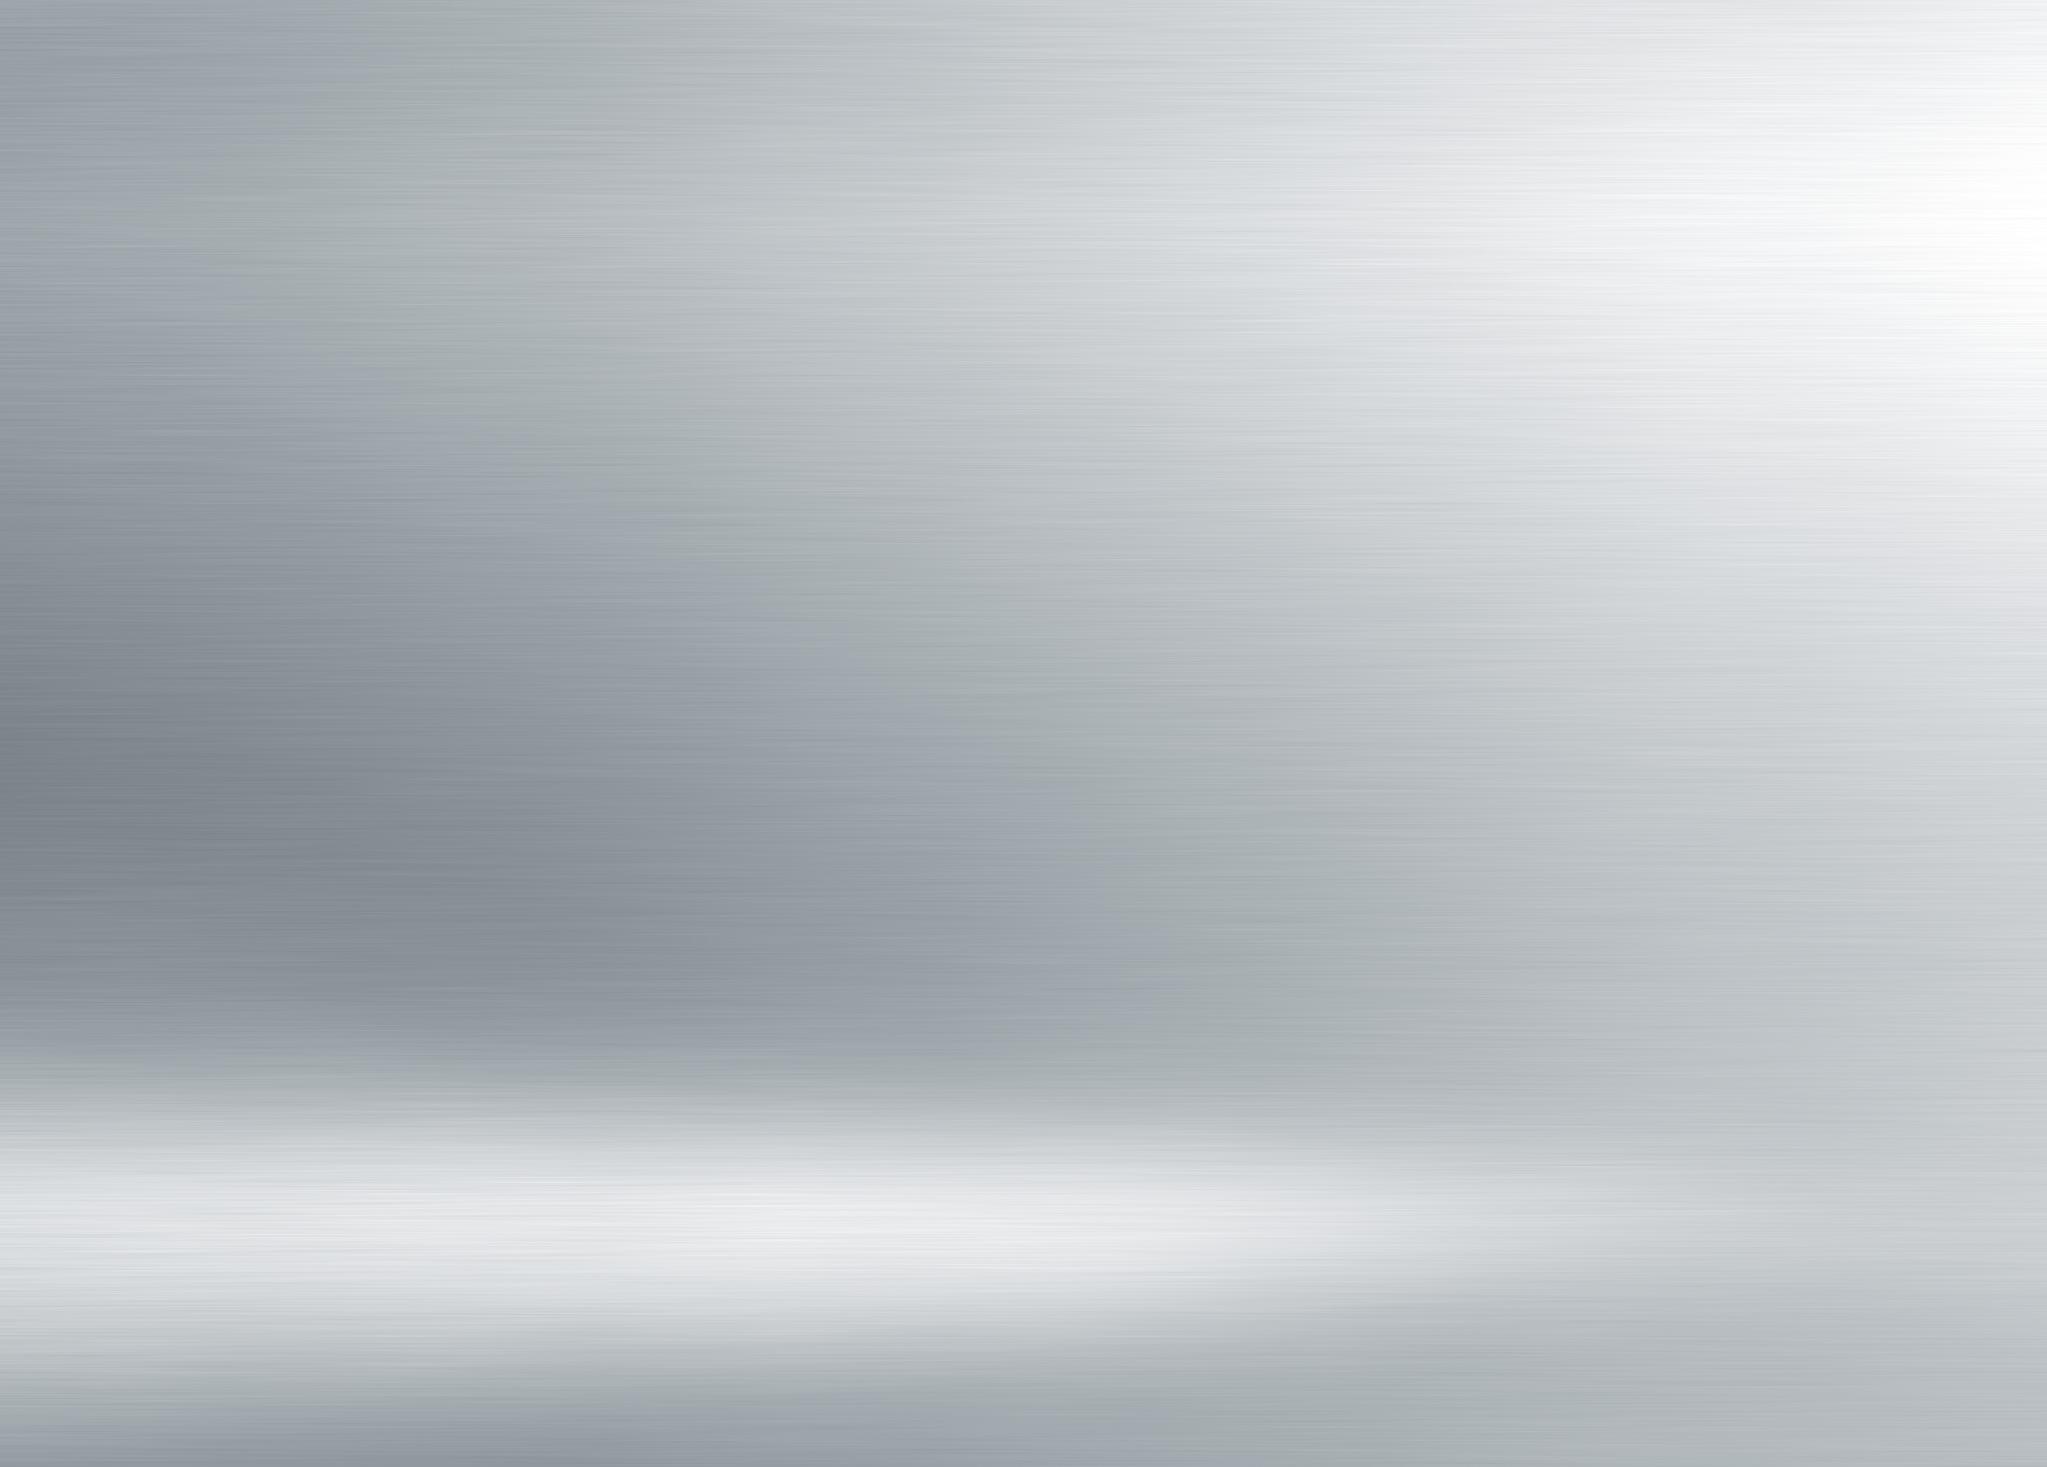 Silver Background Wallpaper Wallpapersafari